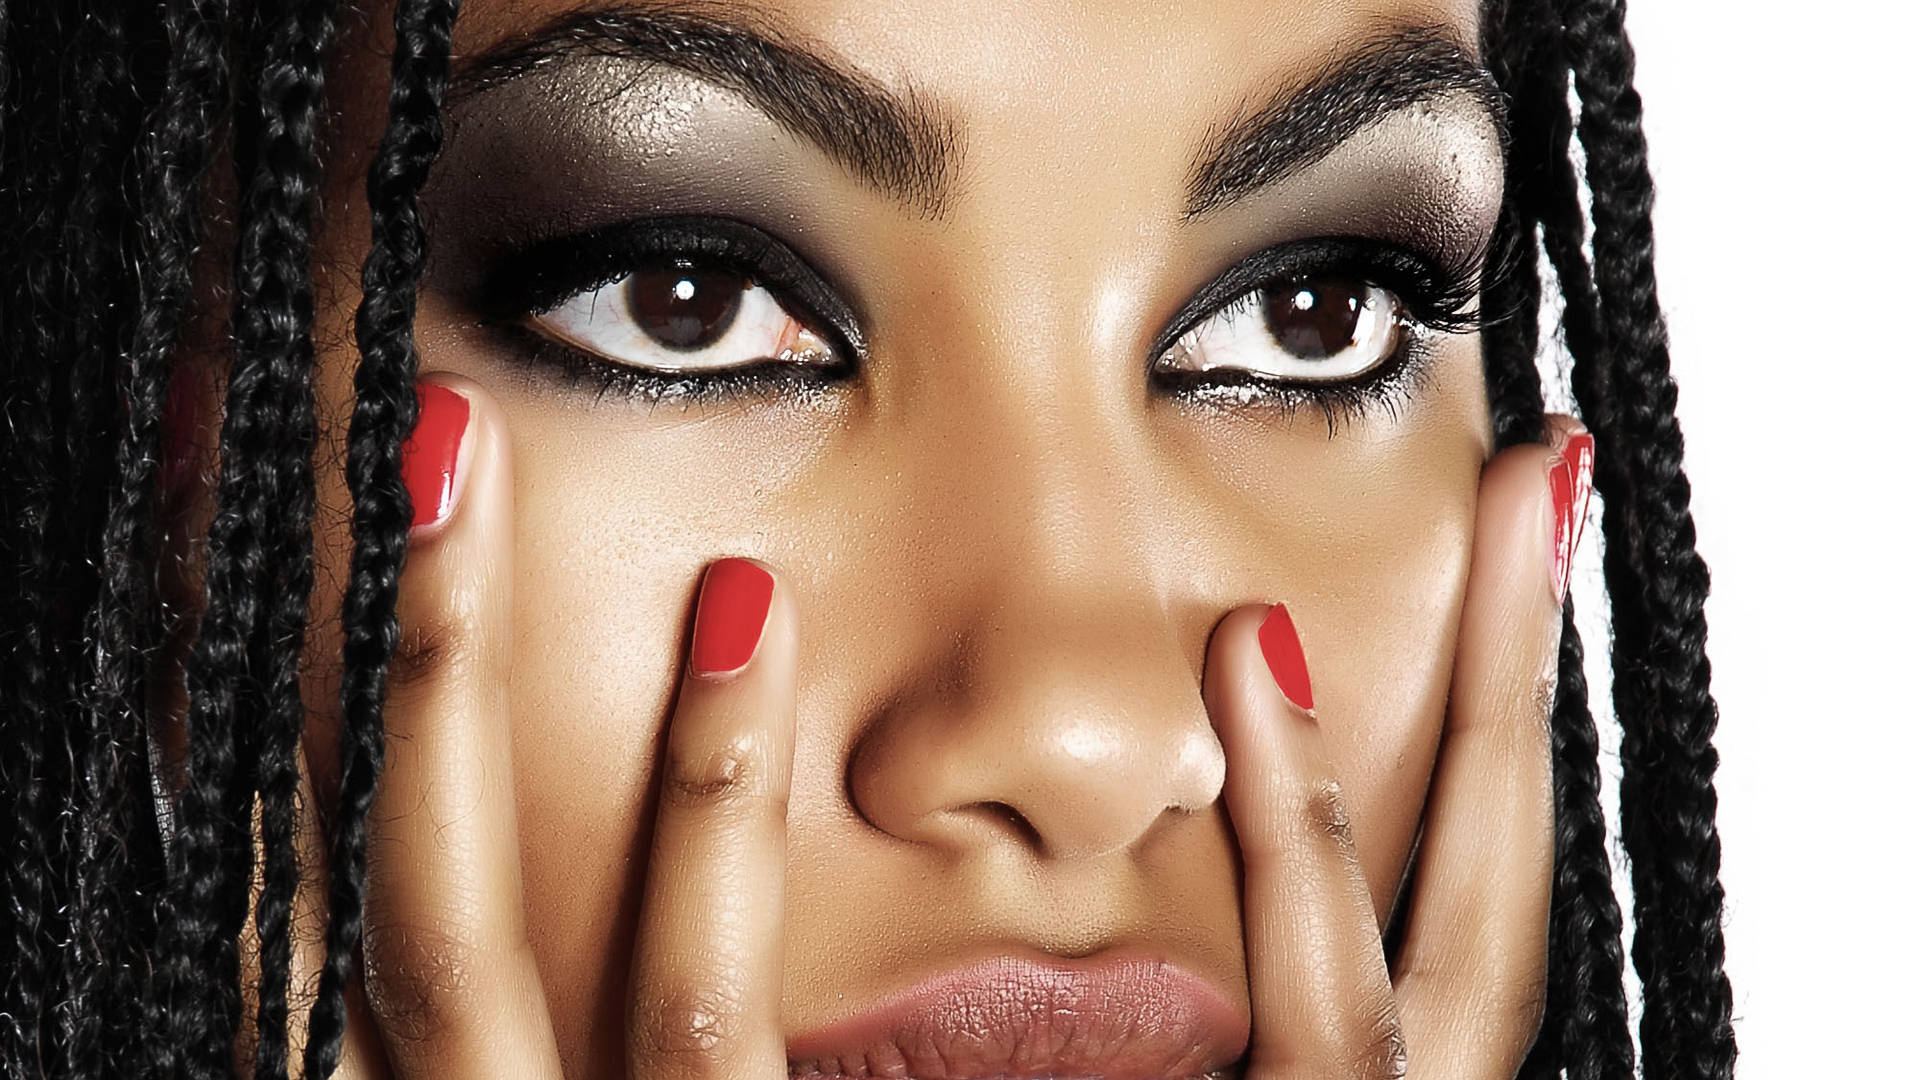 VISAGE: Makeup Services